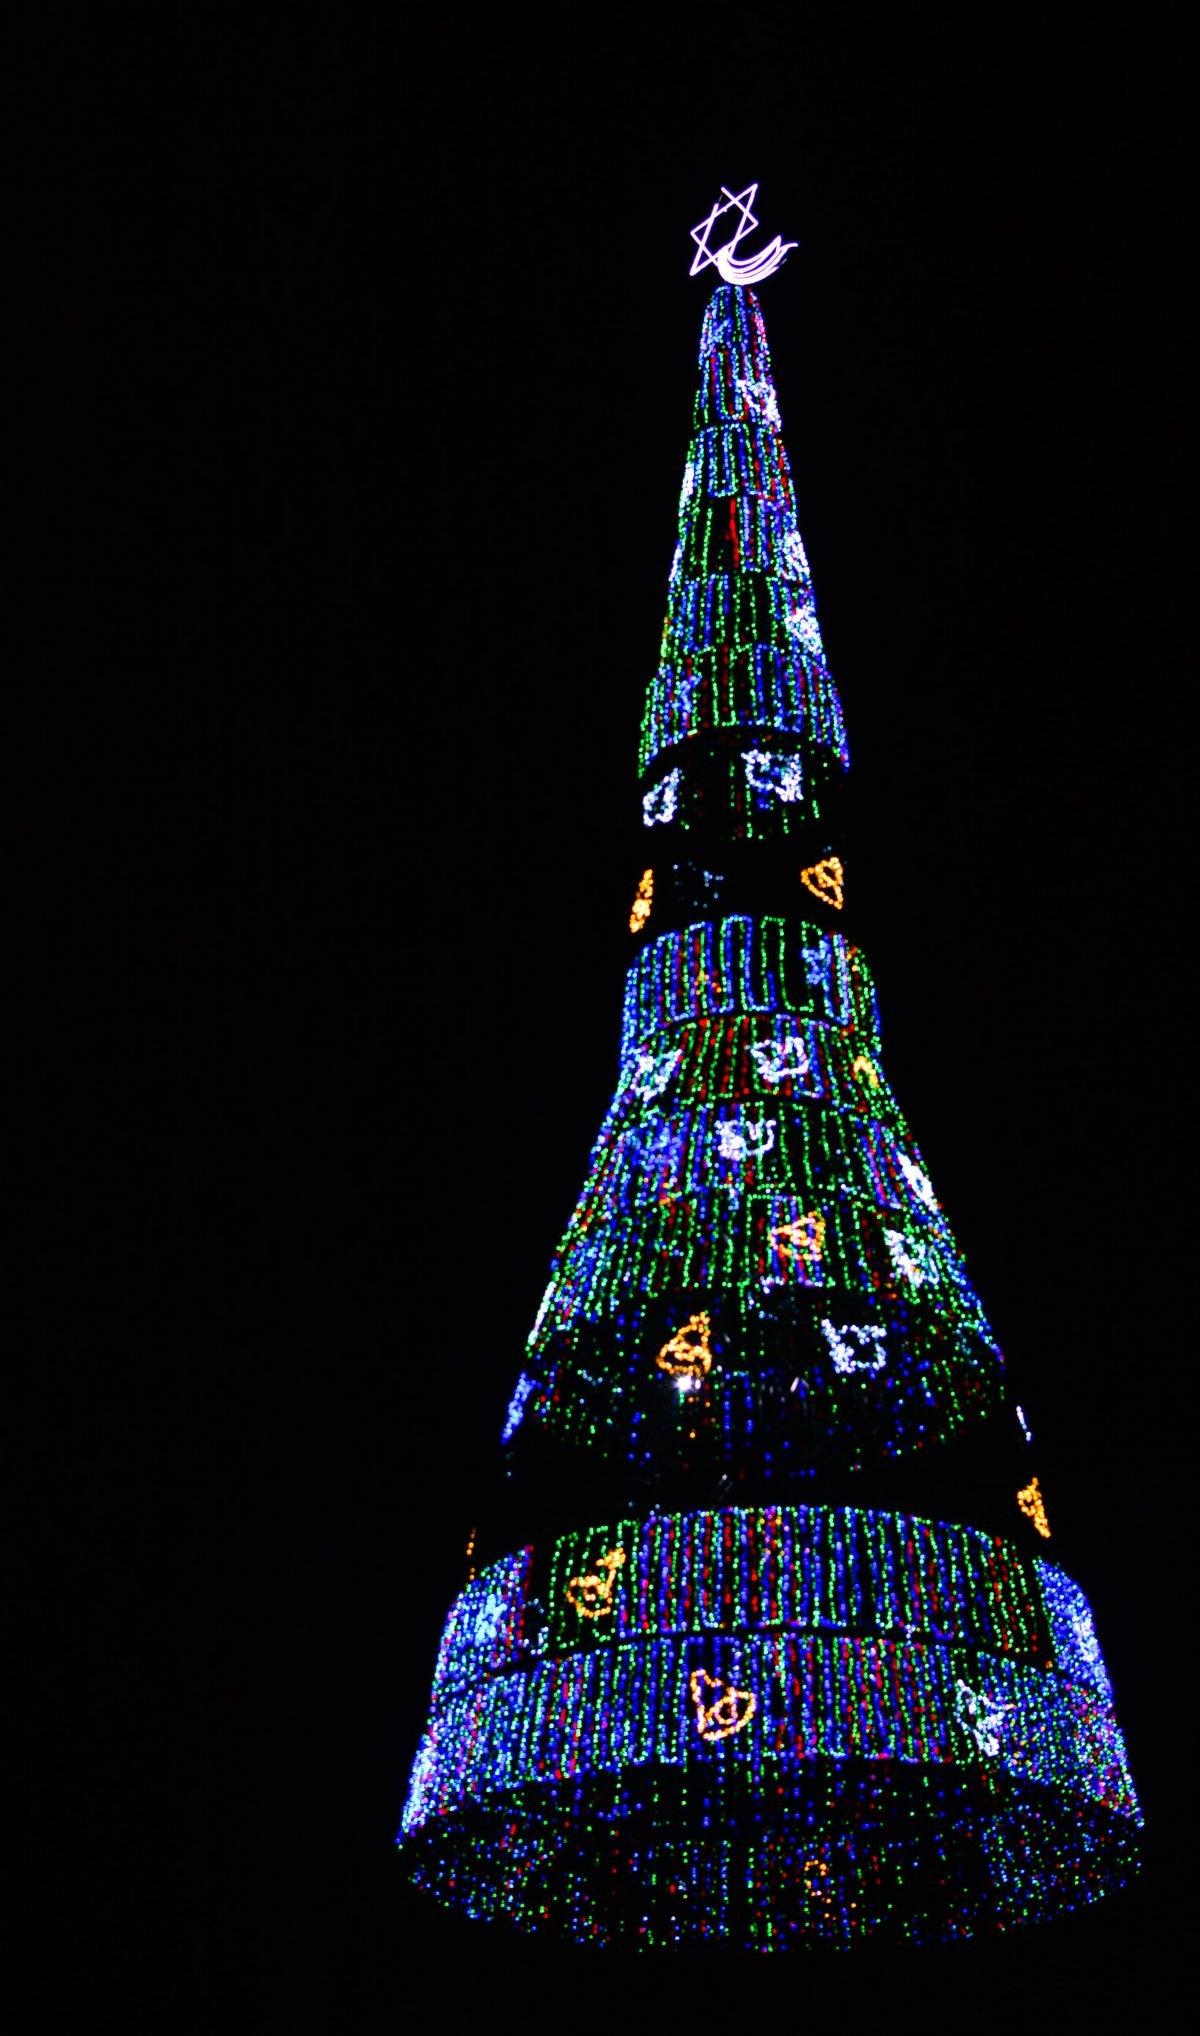 The world's tallest Christmas tree in all its current glory. Image courtesy: Thiva Arunagirinathan / Roar.lk